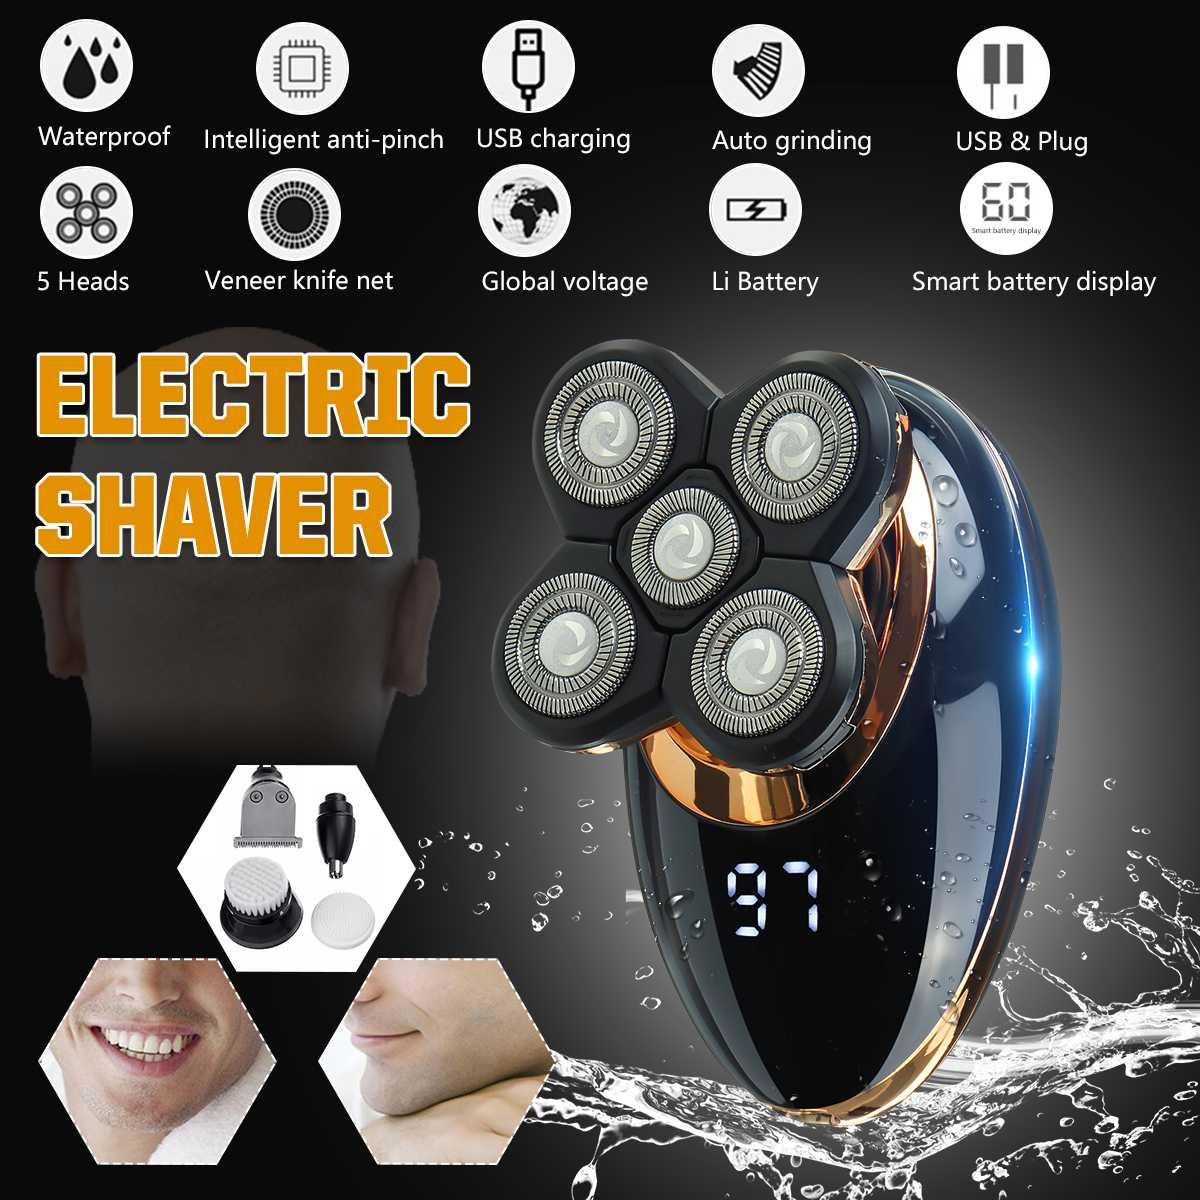 Afeitadora eléctrica recargable por USB 5 en 1, 4D IPX5, diseño ergonómico para hombres y mujeres, cortadora de pelo, esmalte de cabeza calva